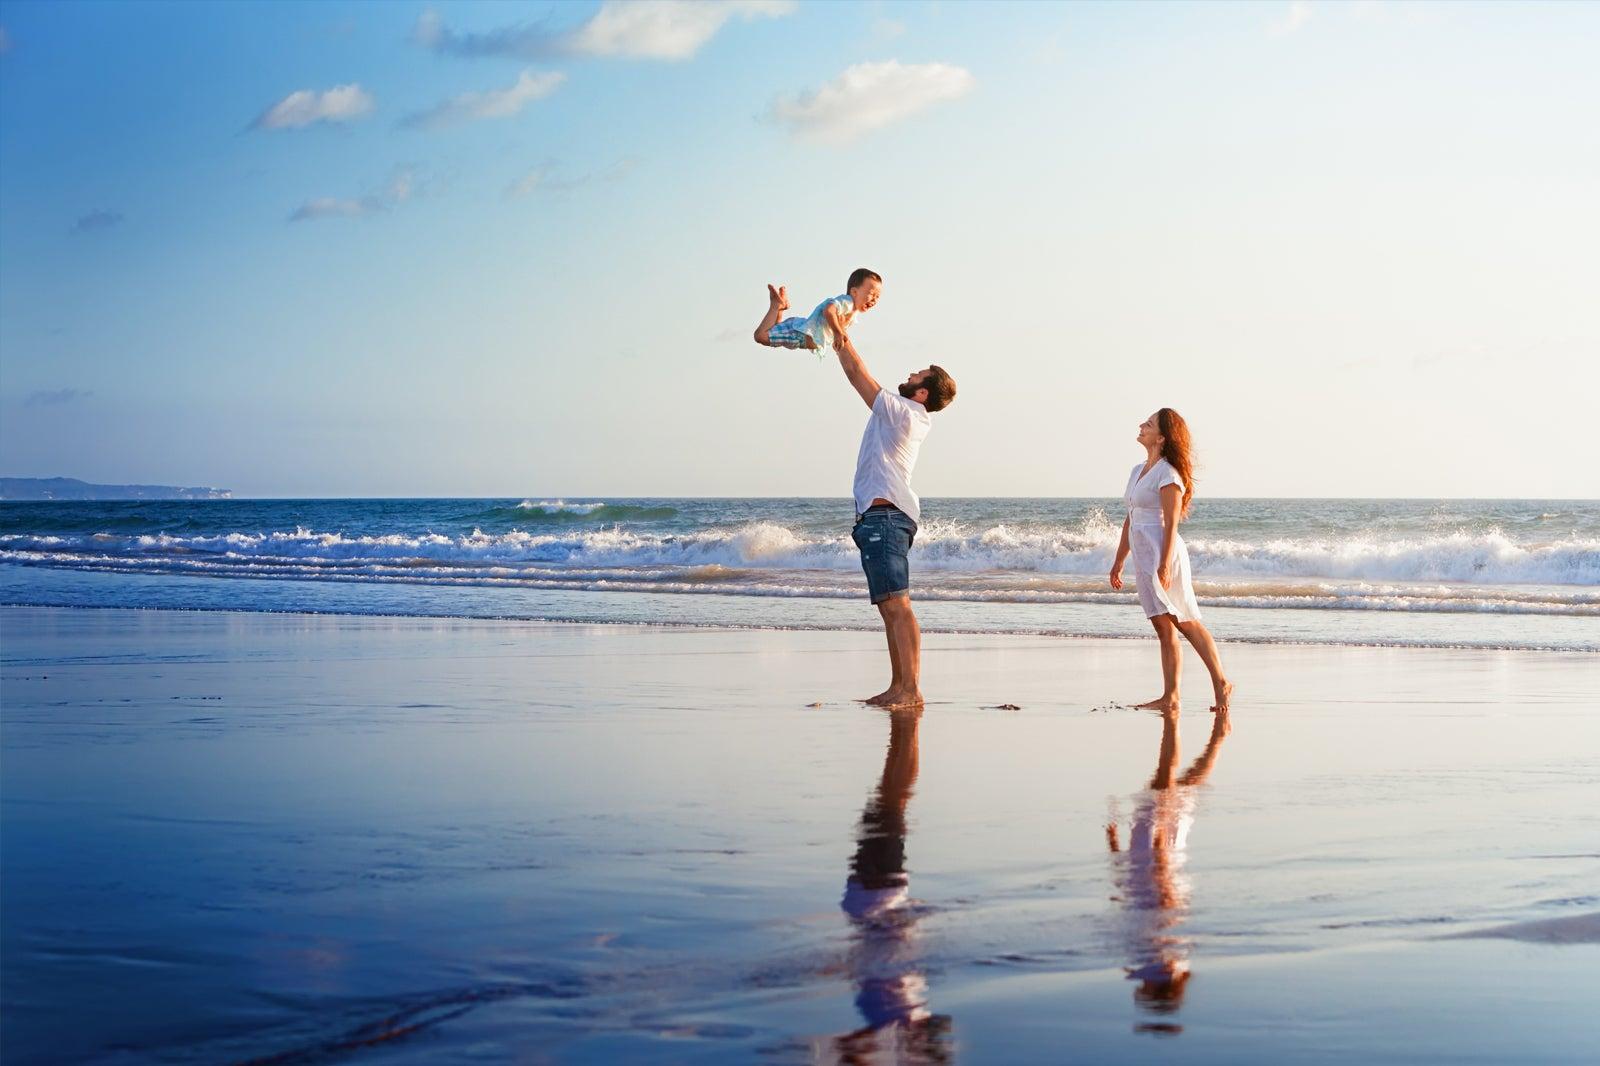 носят бегущая семья по берегу океана картинки фото изготовлена